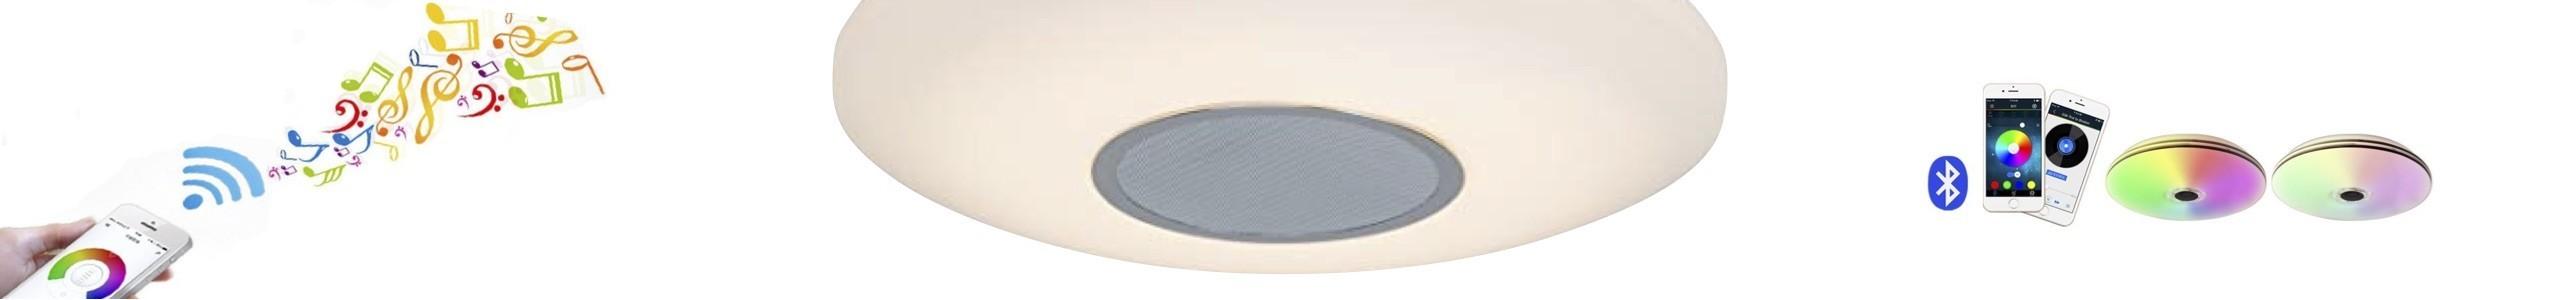 Serie Bluetooth